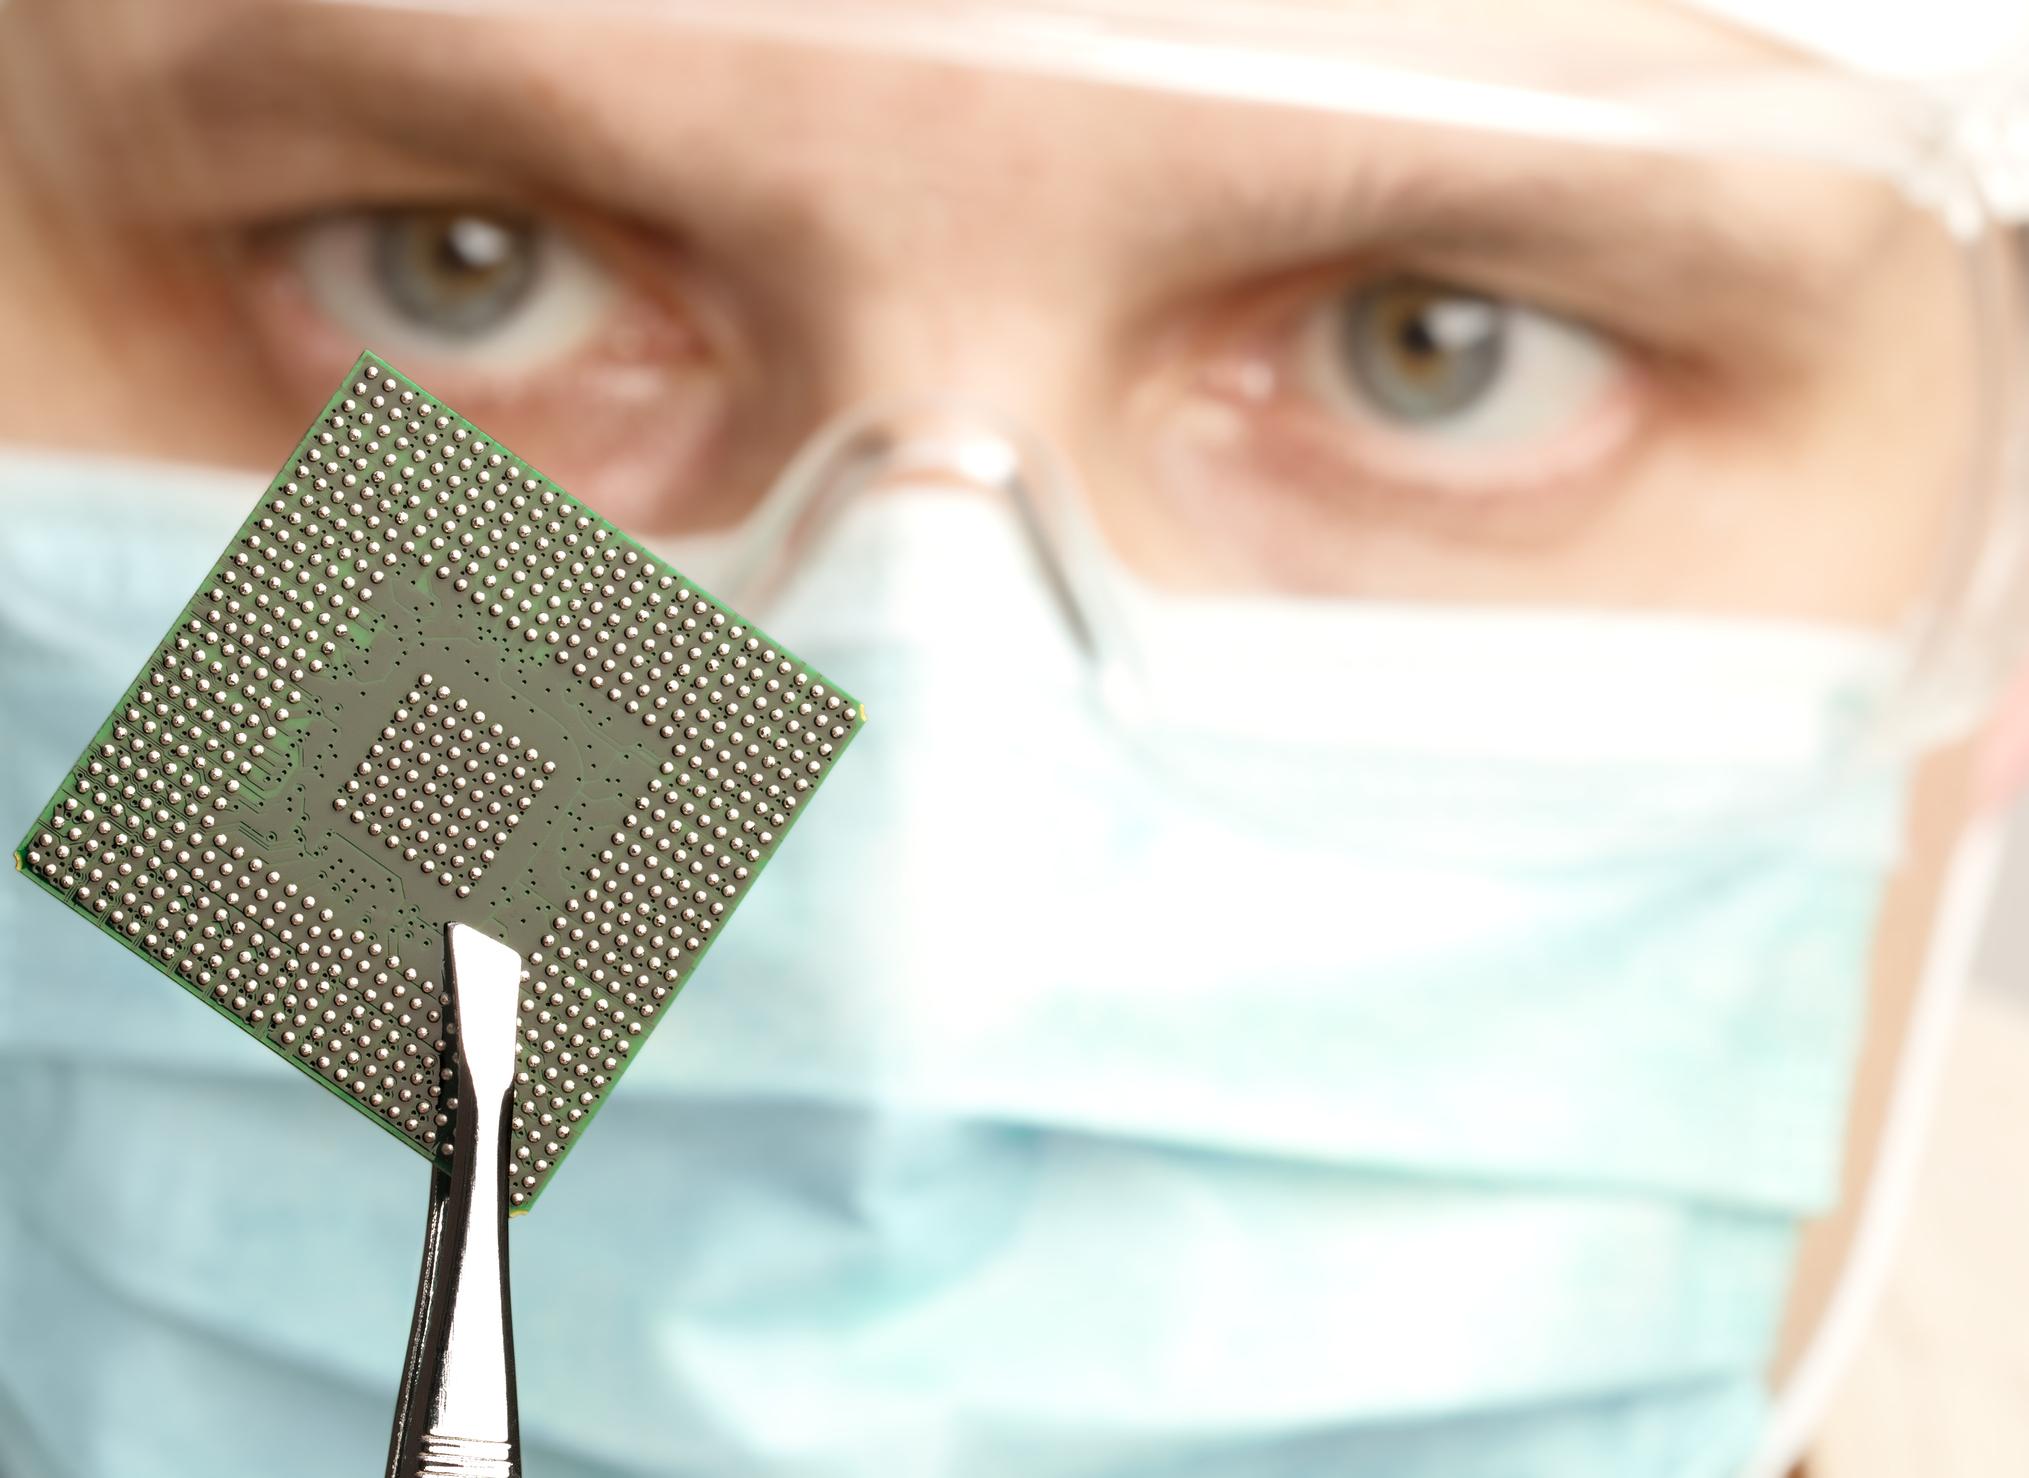 Man holding a microchip in tweezers.